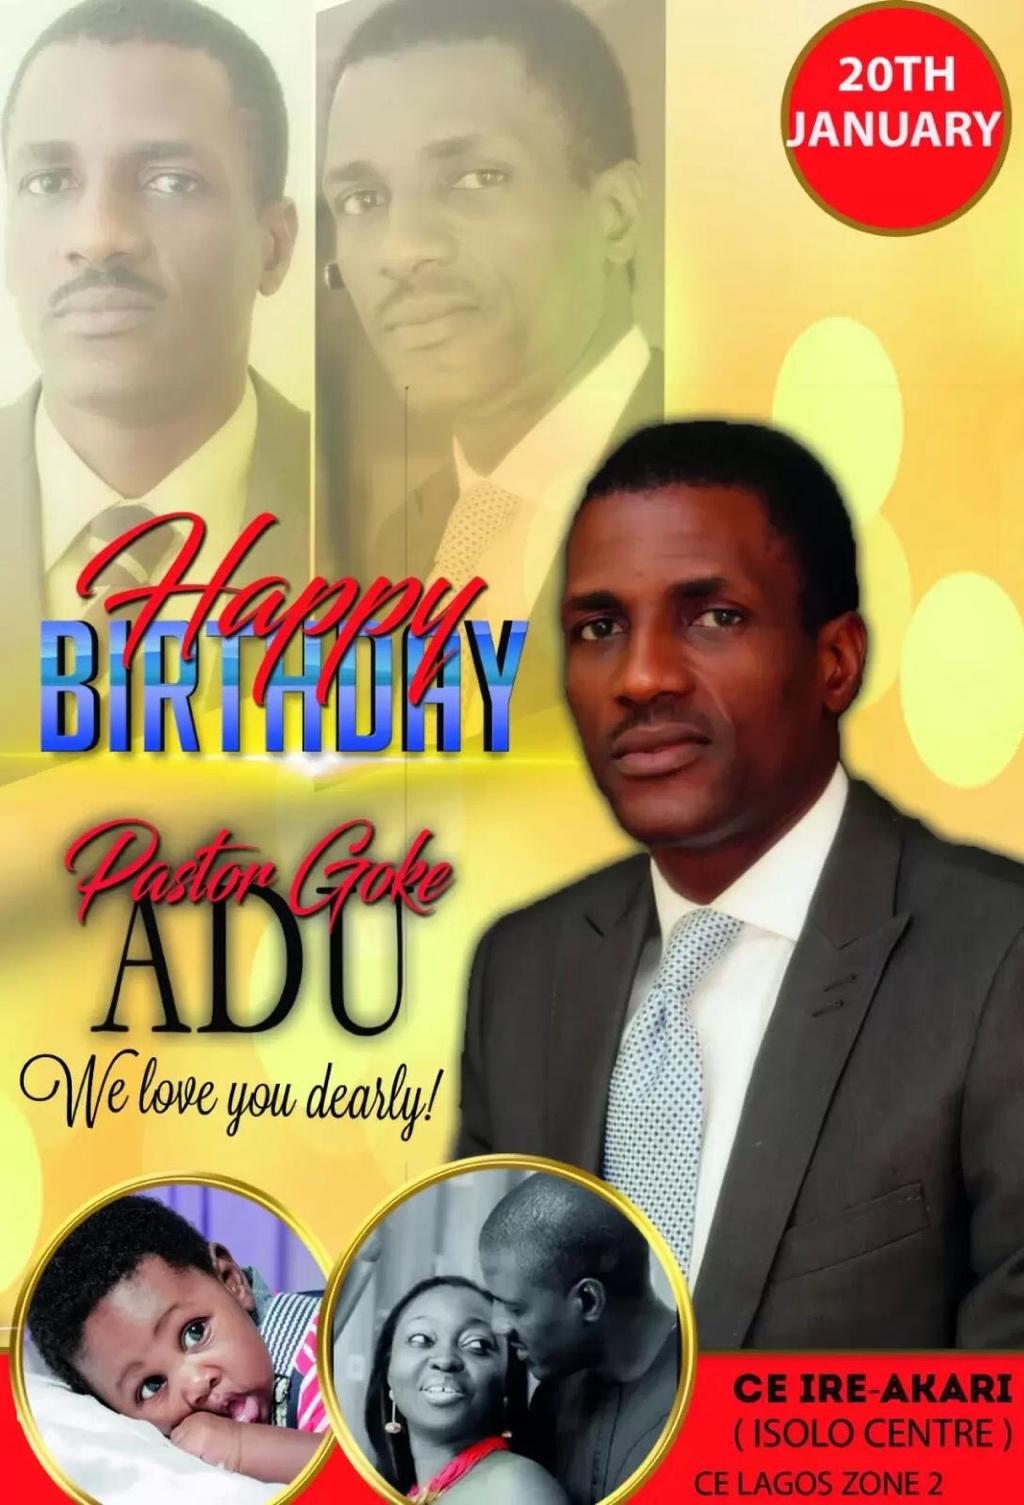 Happy birthday Pastor Goke. It's